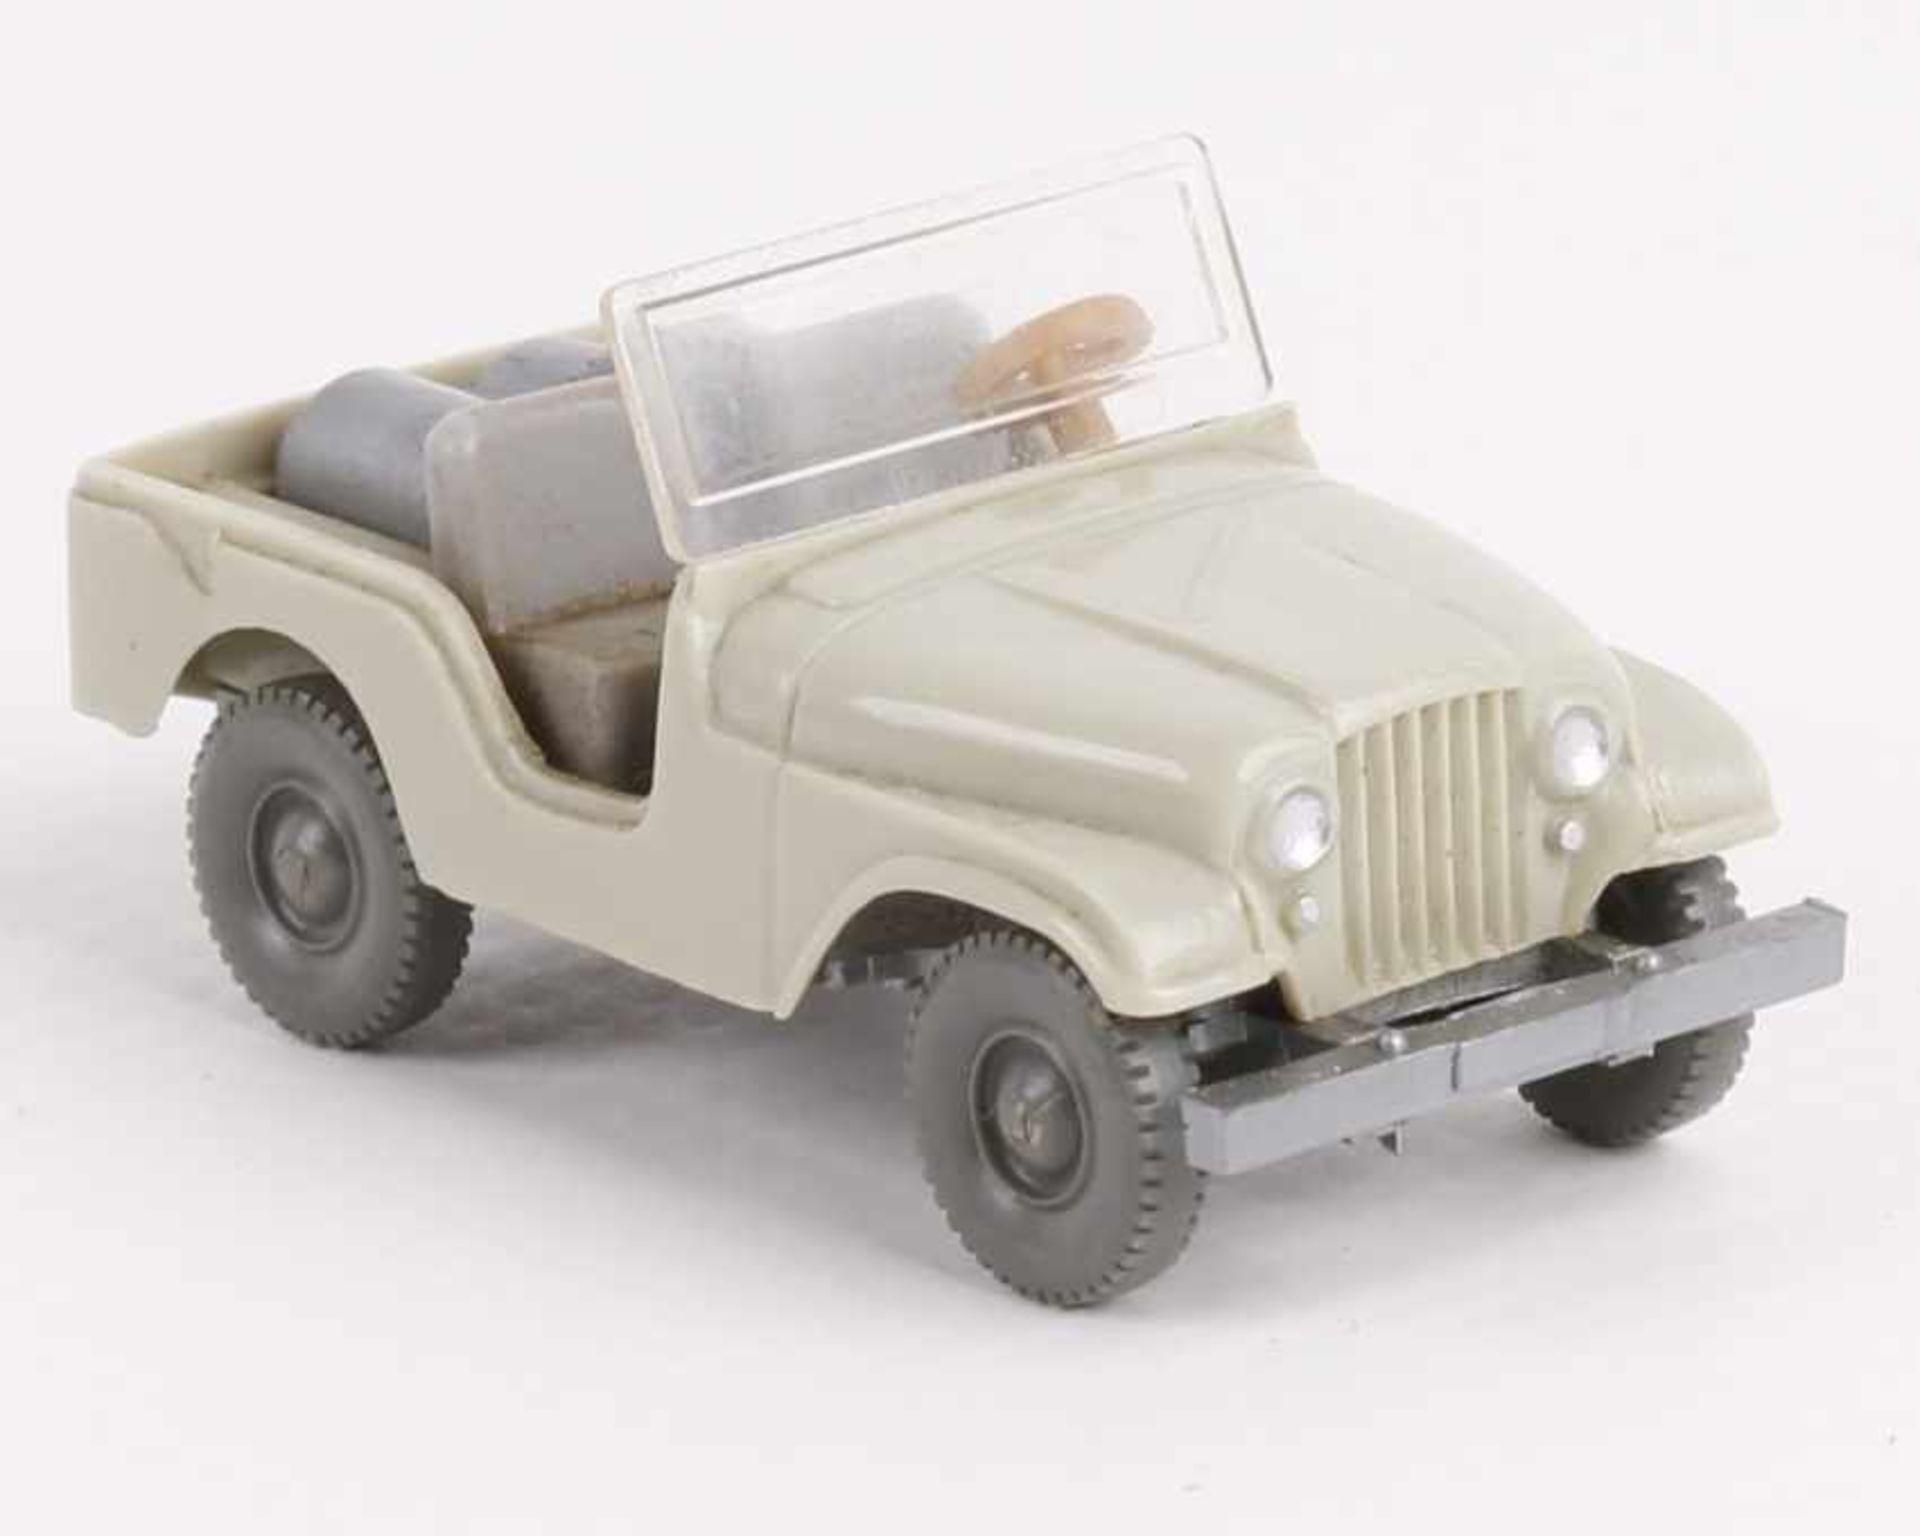 Los 1045 - WikingFarmer Jeep h'grünbeige12/1b, neuwertig